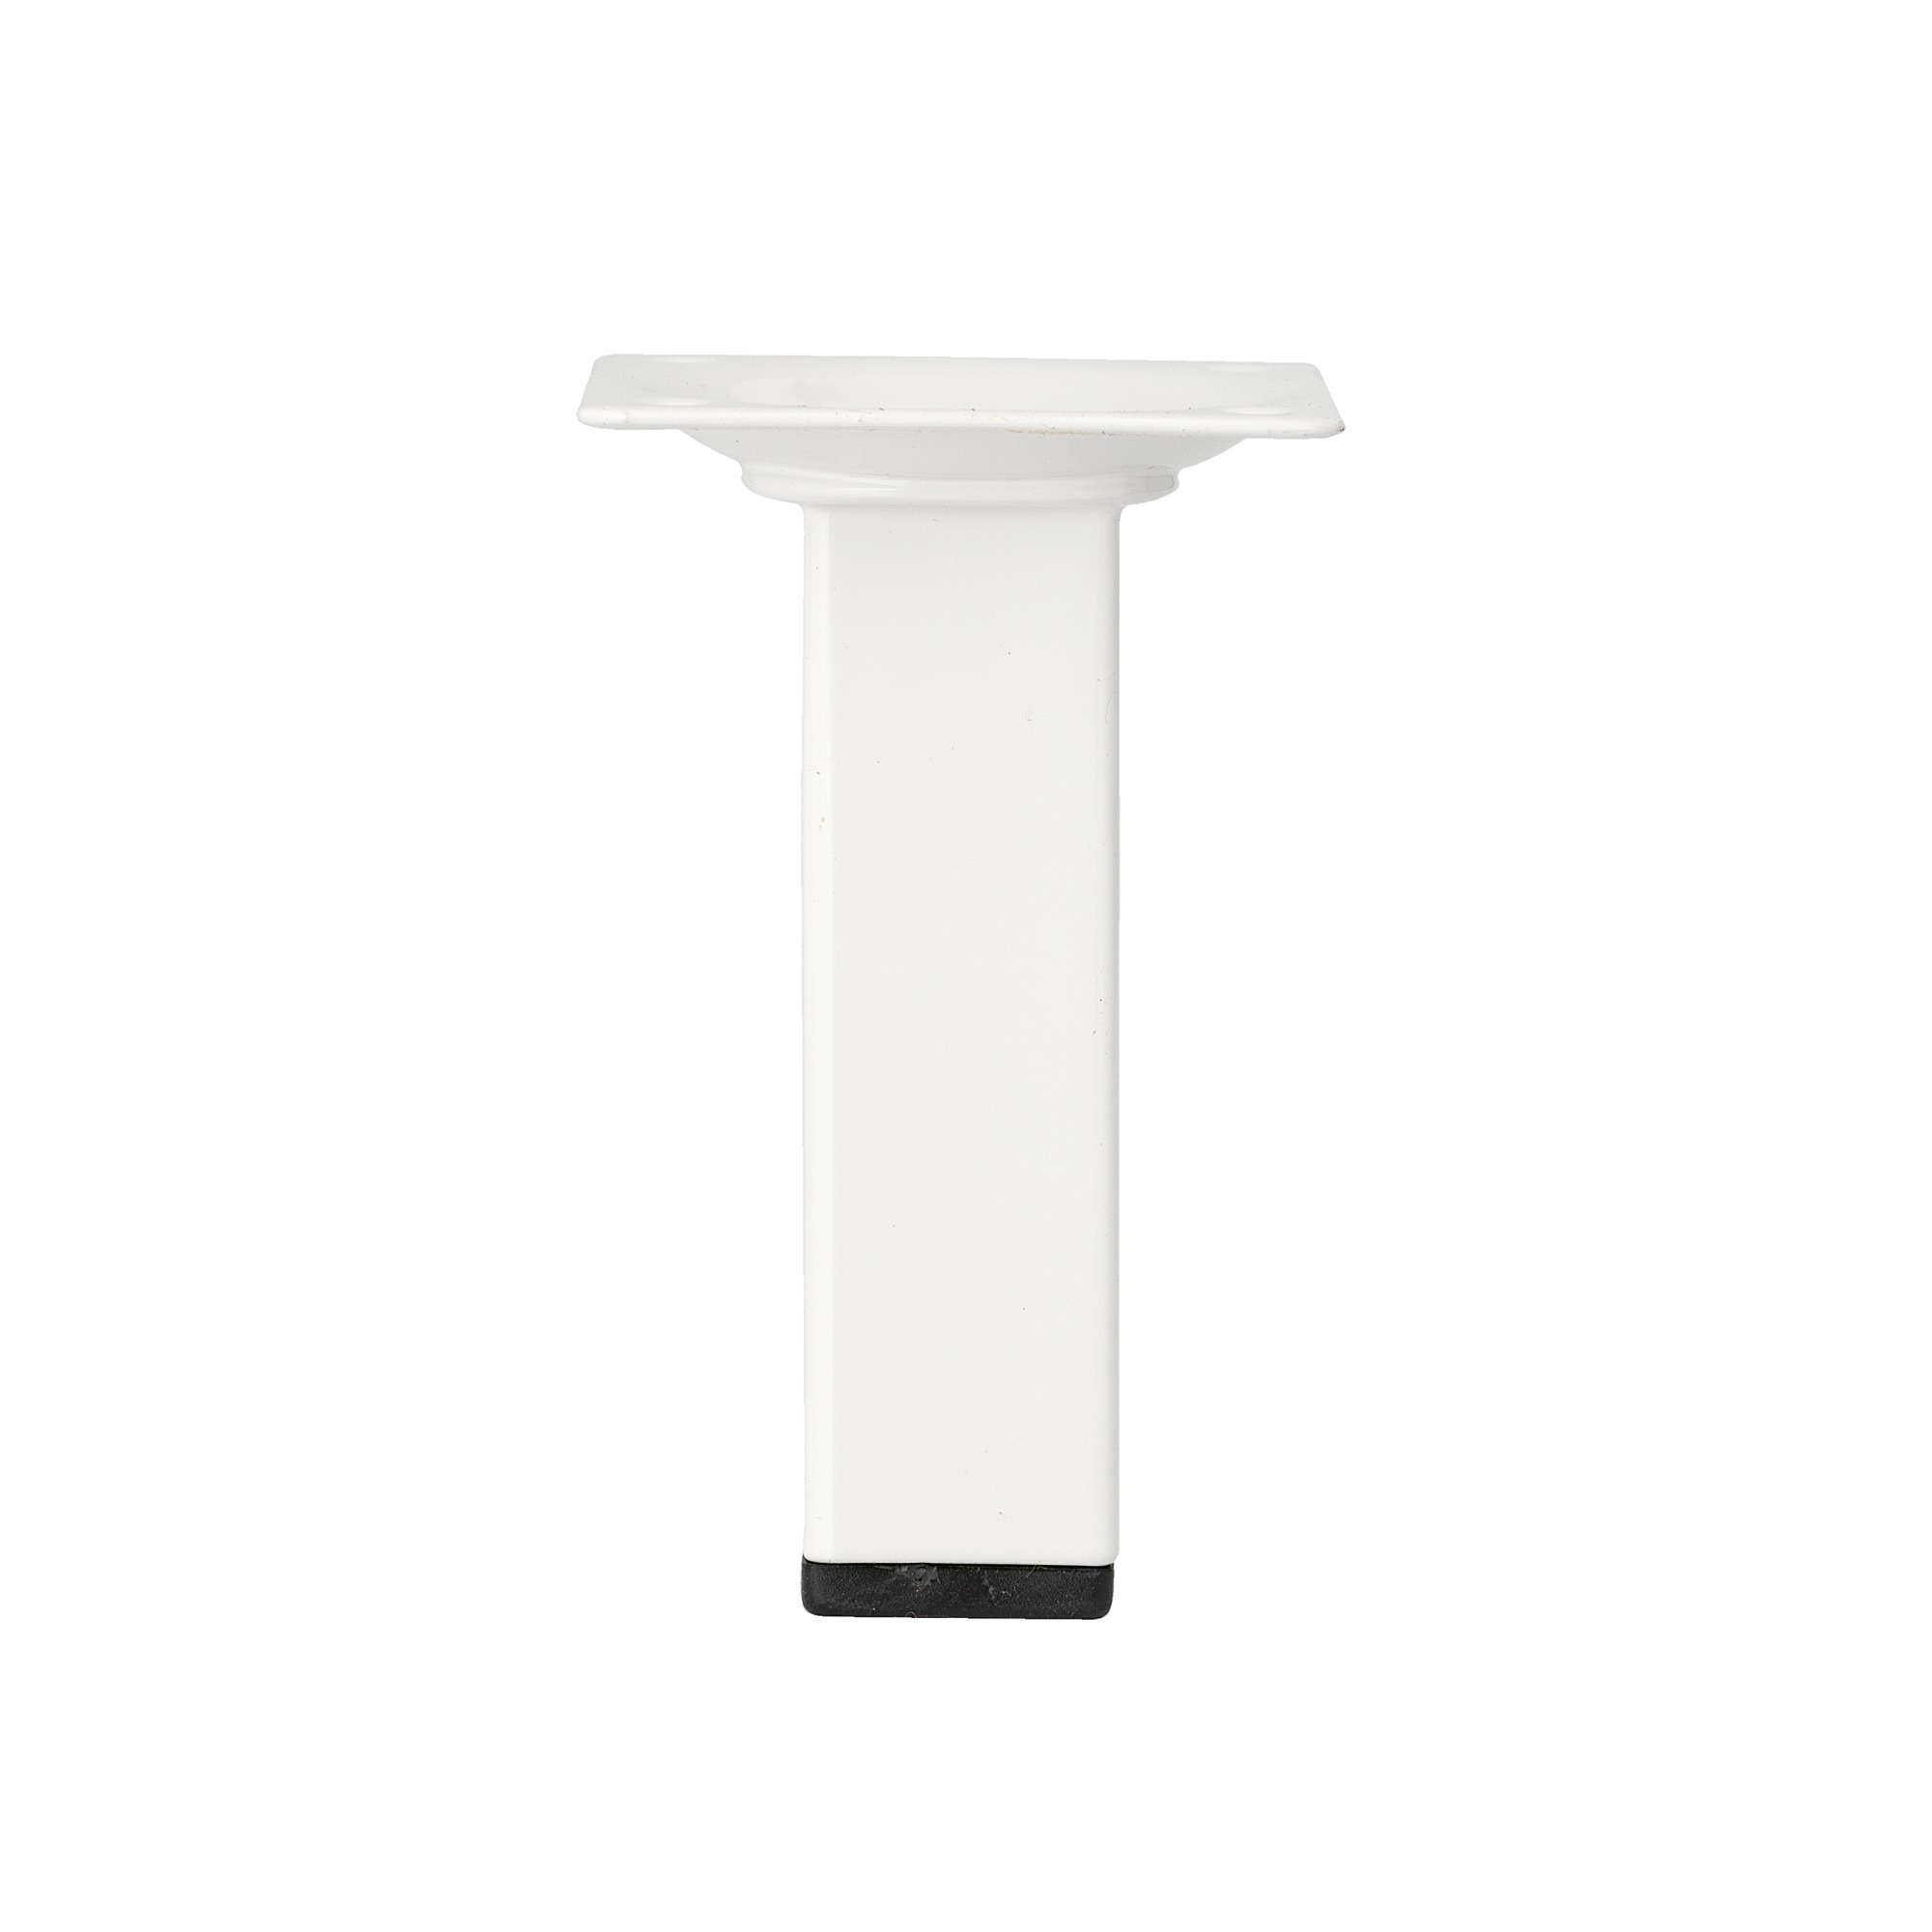 Inspirations meubelpoot vierkant wit 2,5×10 cm